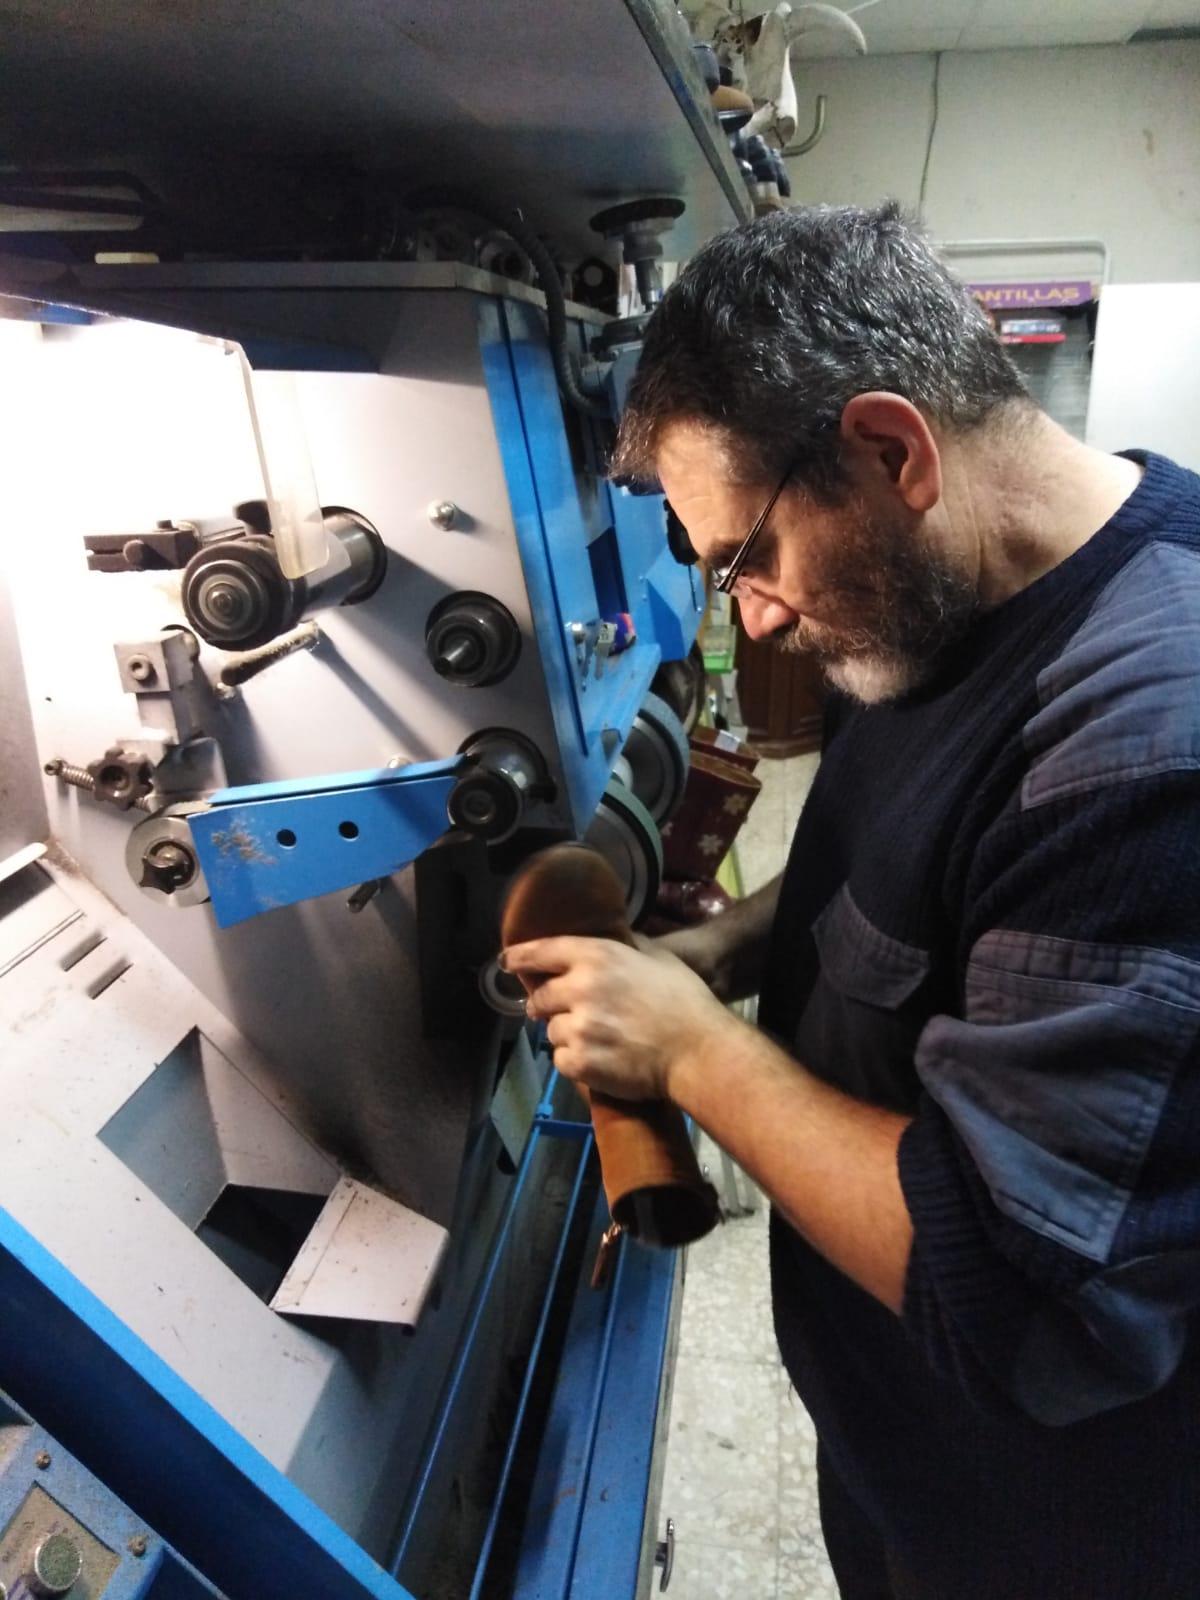 España Reparación de calzado Afilados en cáceres Rapid